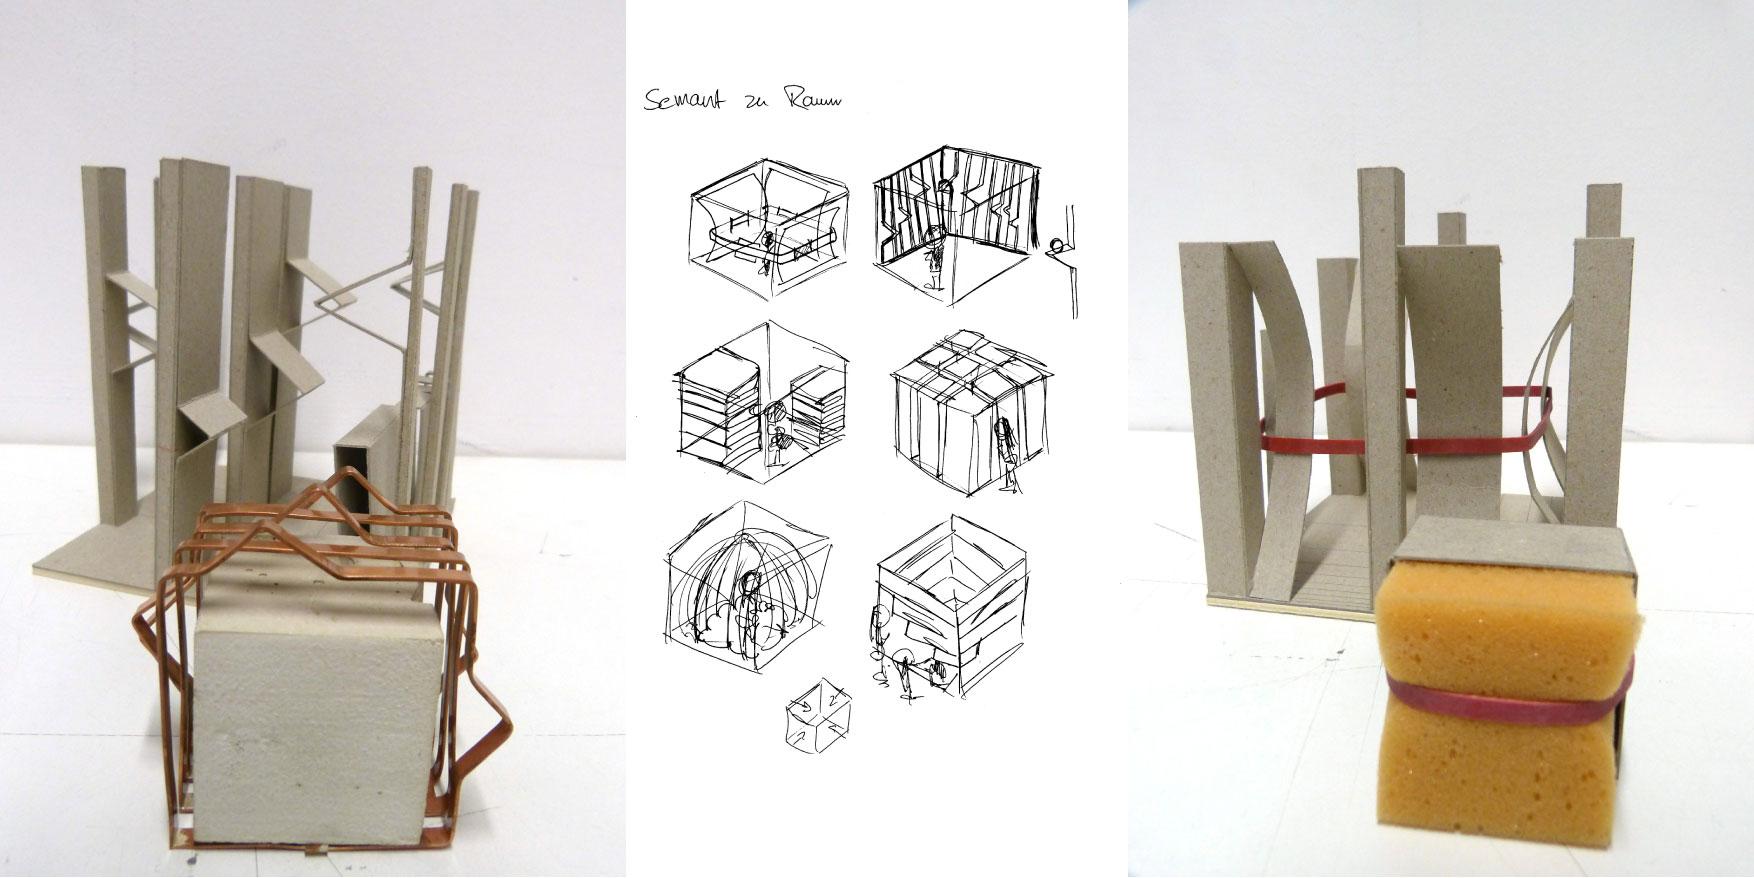 gerrit_schweiger-Nice_to_have-Must_have-unreachable-Accessoire-Accessory-Designprozess-Design_Thinking-Social_Design-Ausstellung-CAD-Raum-Illustration-Skulptur-Plakat-Typographie-Ausstellung-III